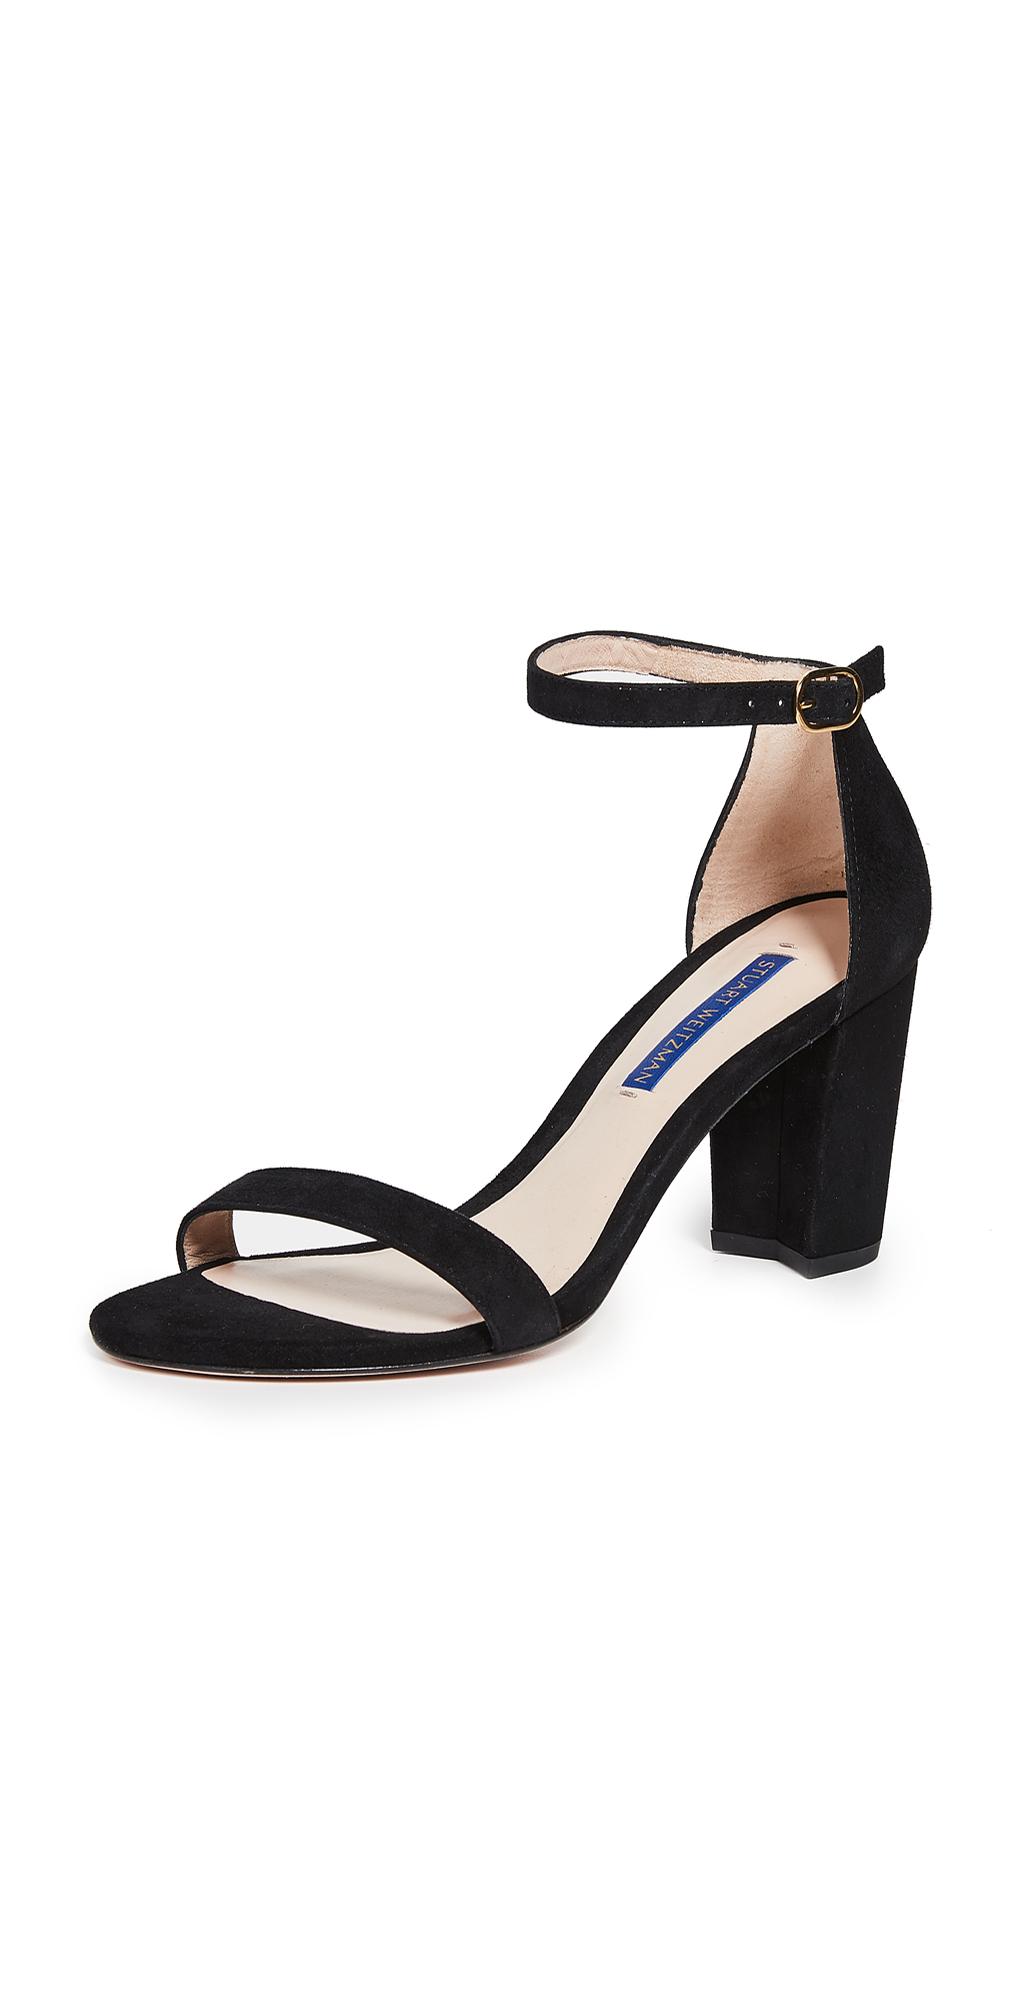 Stuart Weitzman Nearlynude Sandals